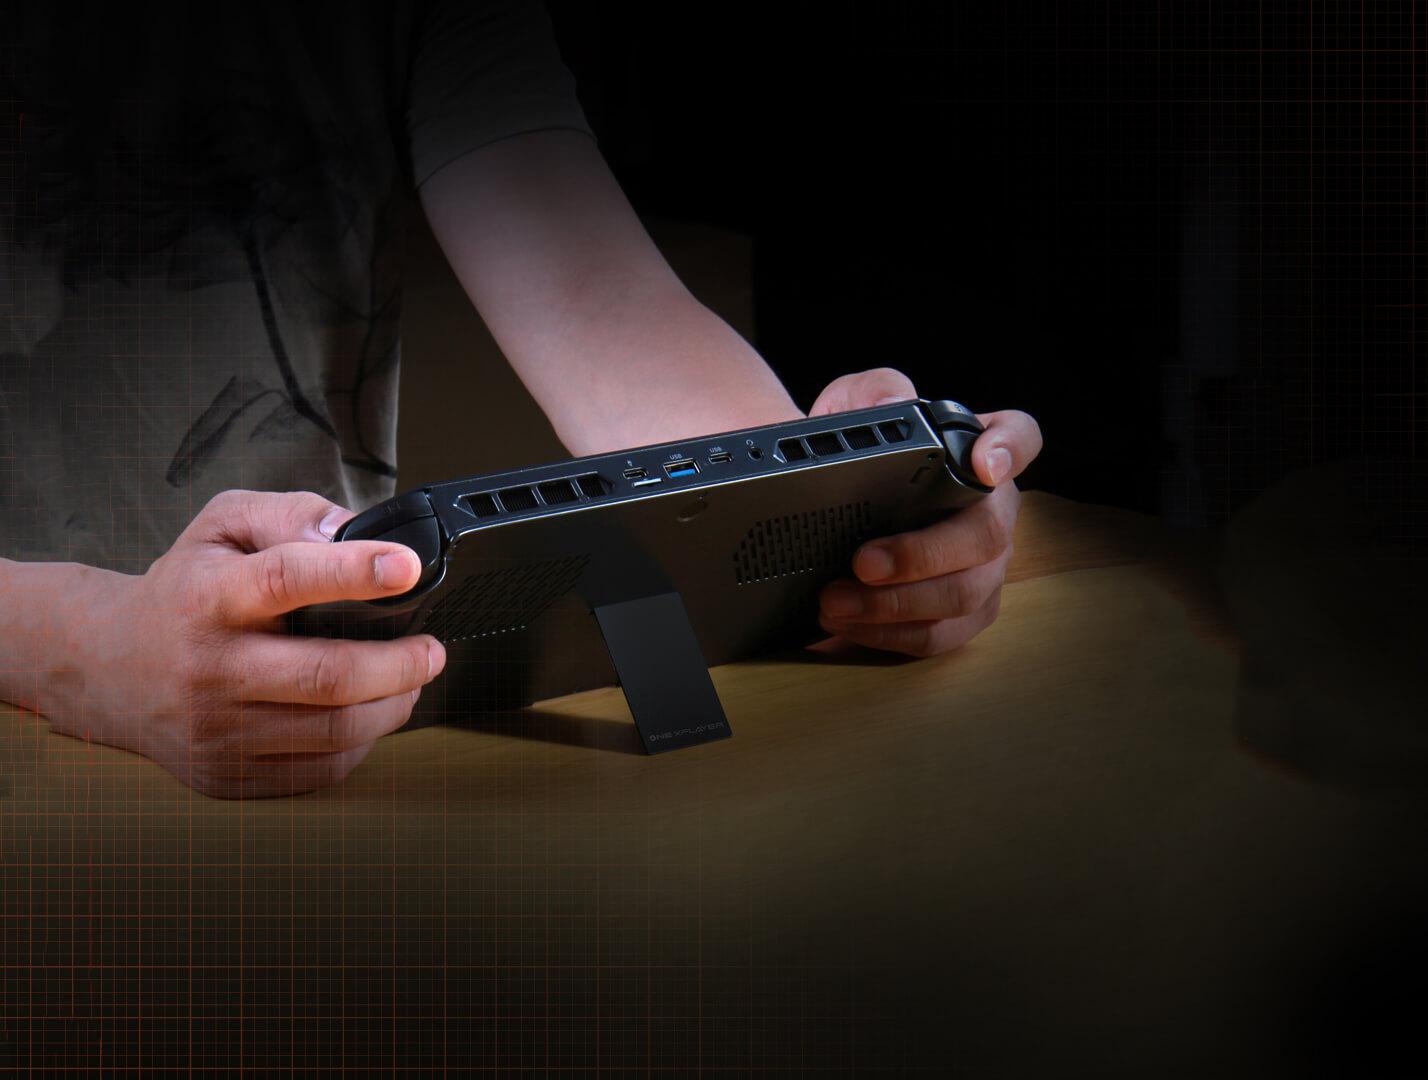 https://www.one-netbook.jp/wordpress/wp-content/themes/one-netbook/img/teaser/one-xplayer/kickstand_bg.jpg